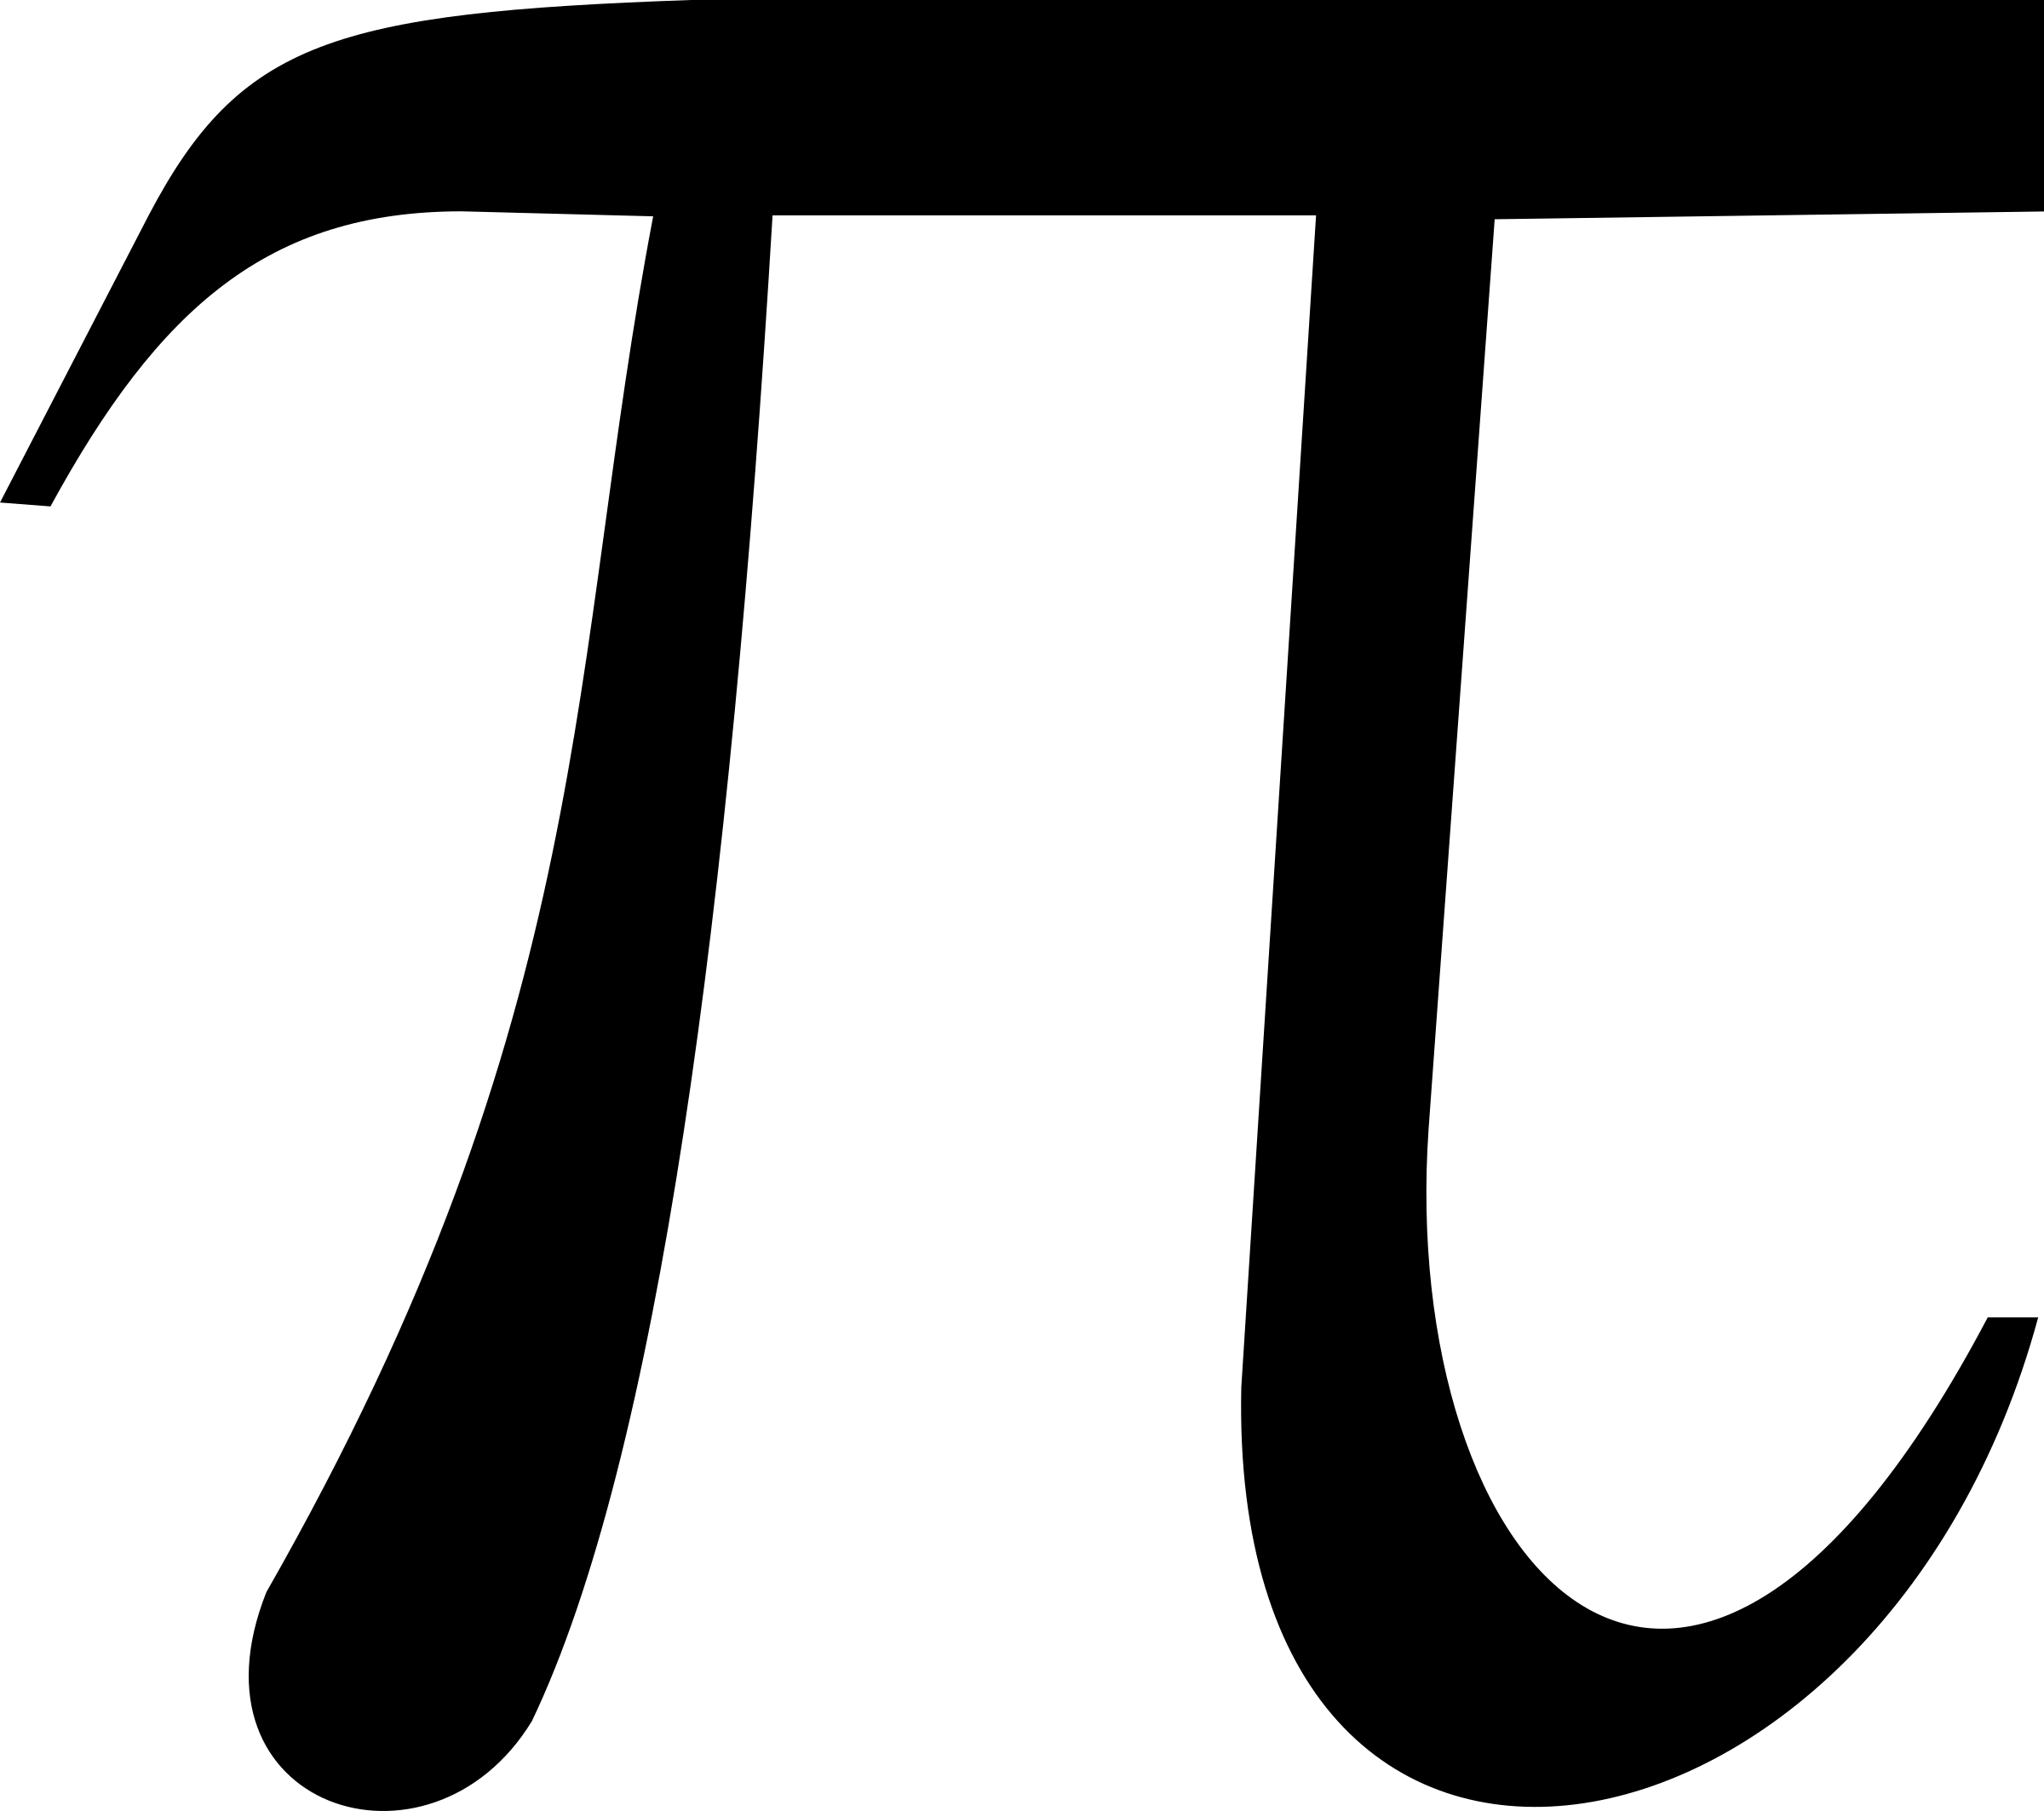 I love pi clipart jpg black and white stock Clipart - math pi symbol jpg black and white stock